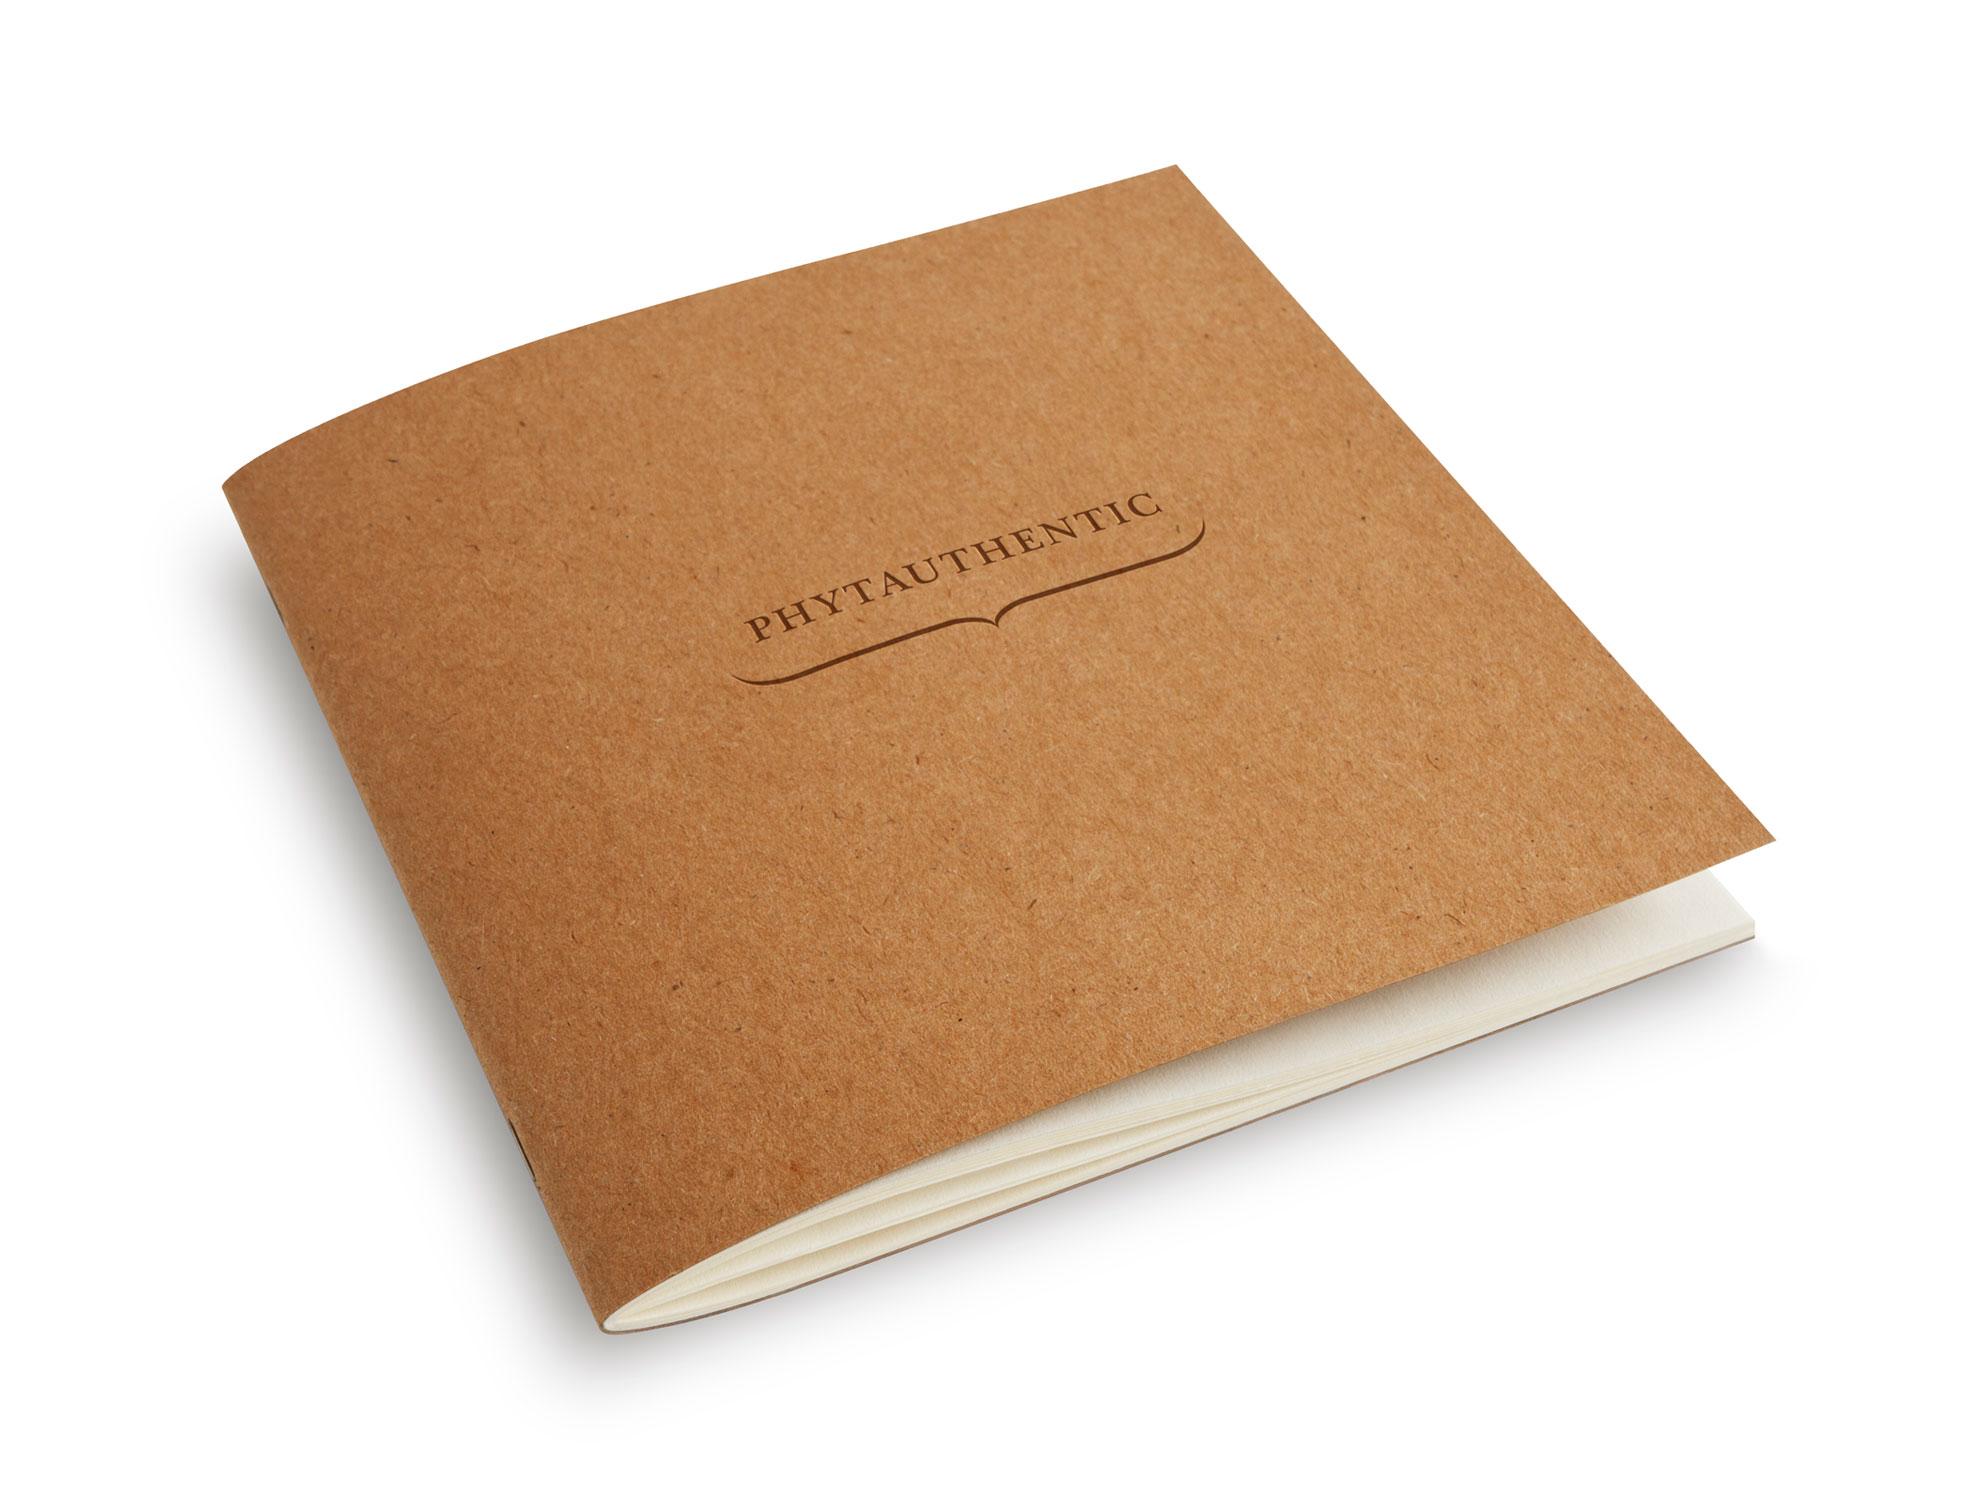 creation-design-graphique-identite-visuelle-adn-de-marque-naming-logo-herboristerie-nico-nico-nicolas-vignais-designer-graphique-independant-identite-visuelle-packaging-bordeaux-france-2